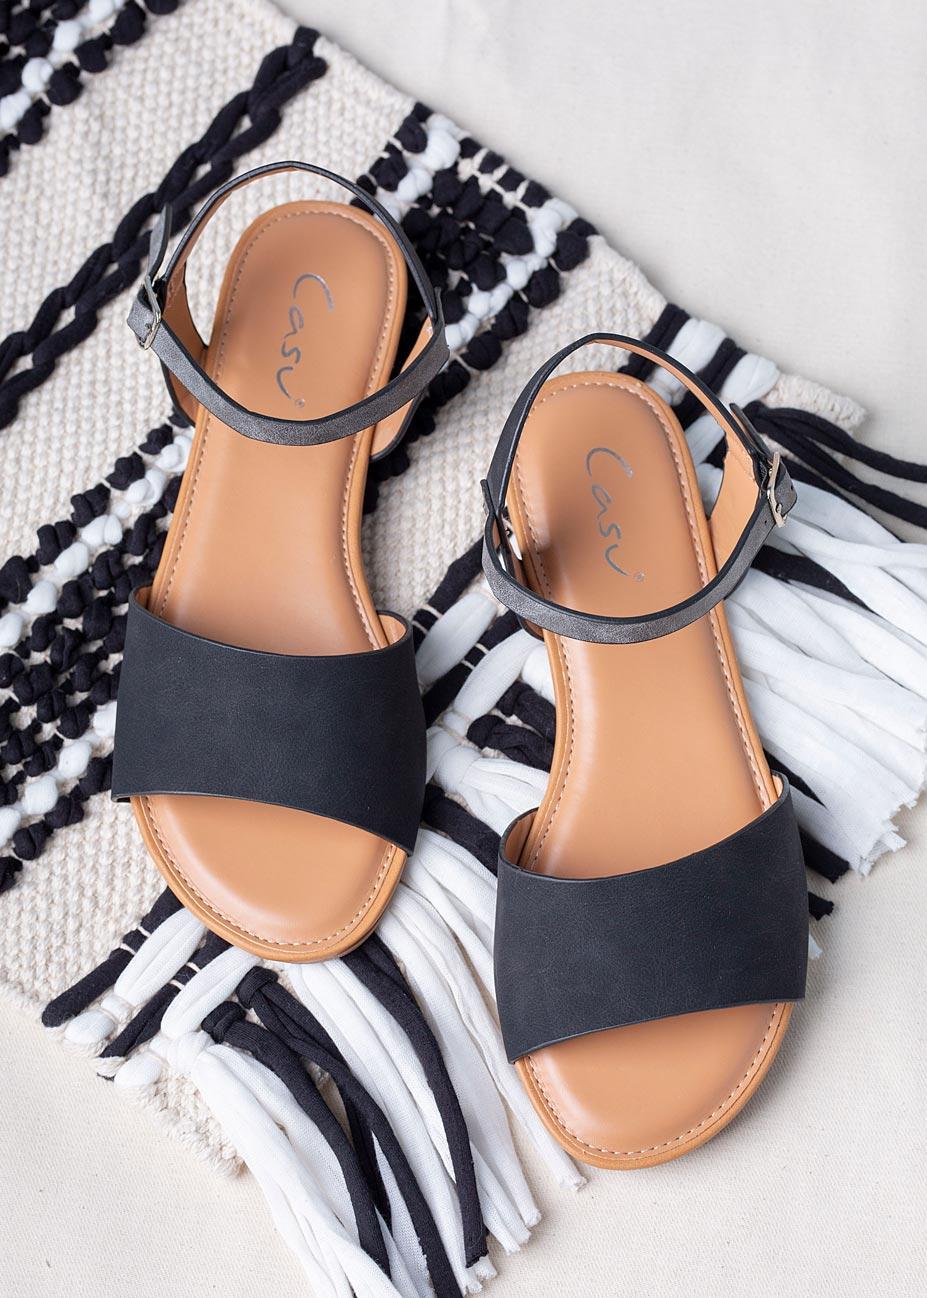 Czarne sandały płaskie Casu RT20X1/B model RT20X1/B